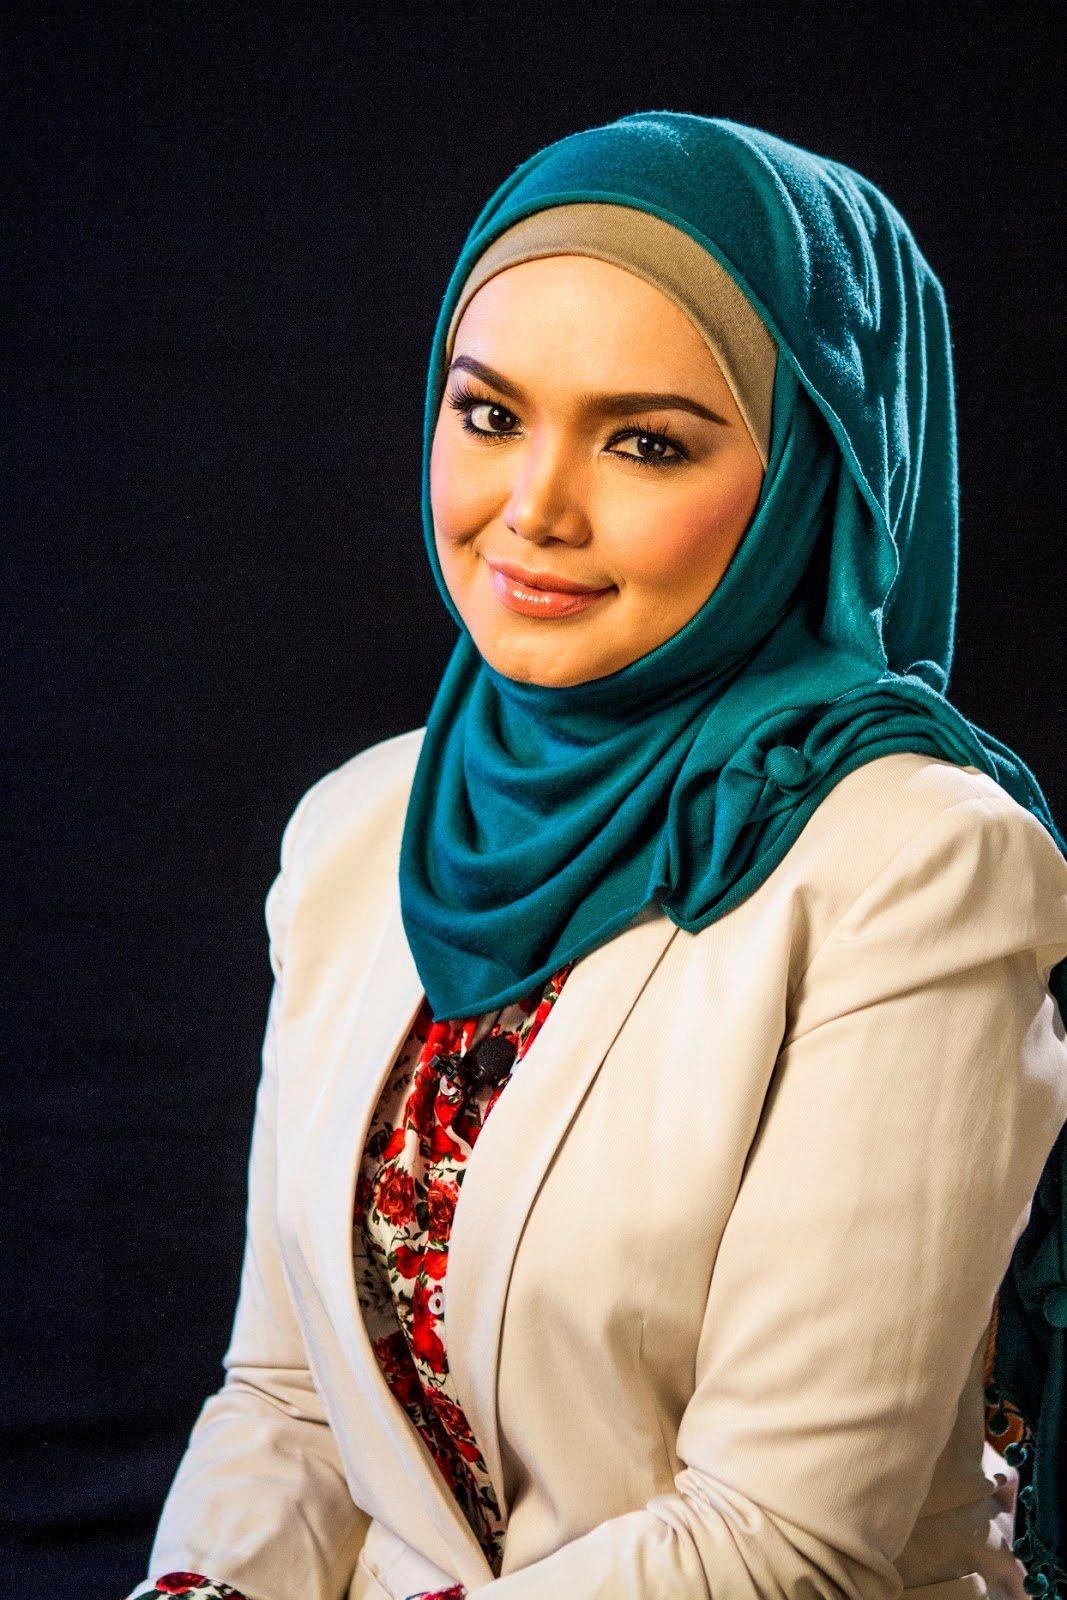 Nyawaku gambar imej terbaru siti nurhaliza gambar terbaru for Siti di foto